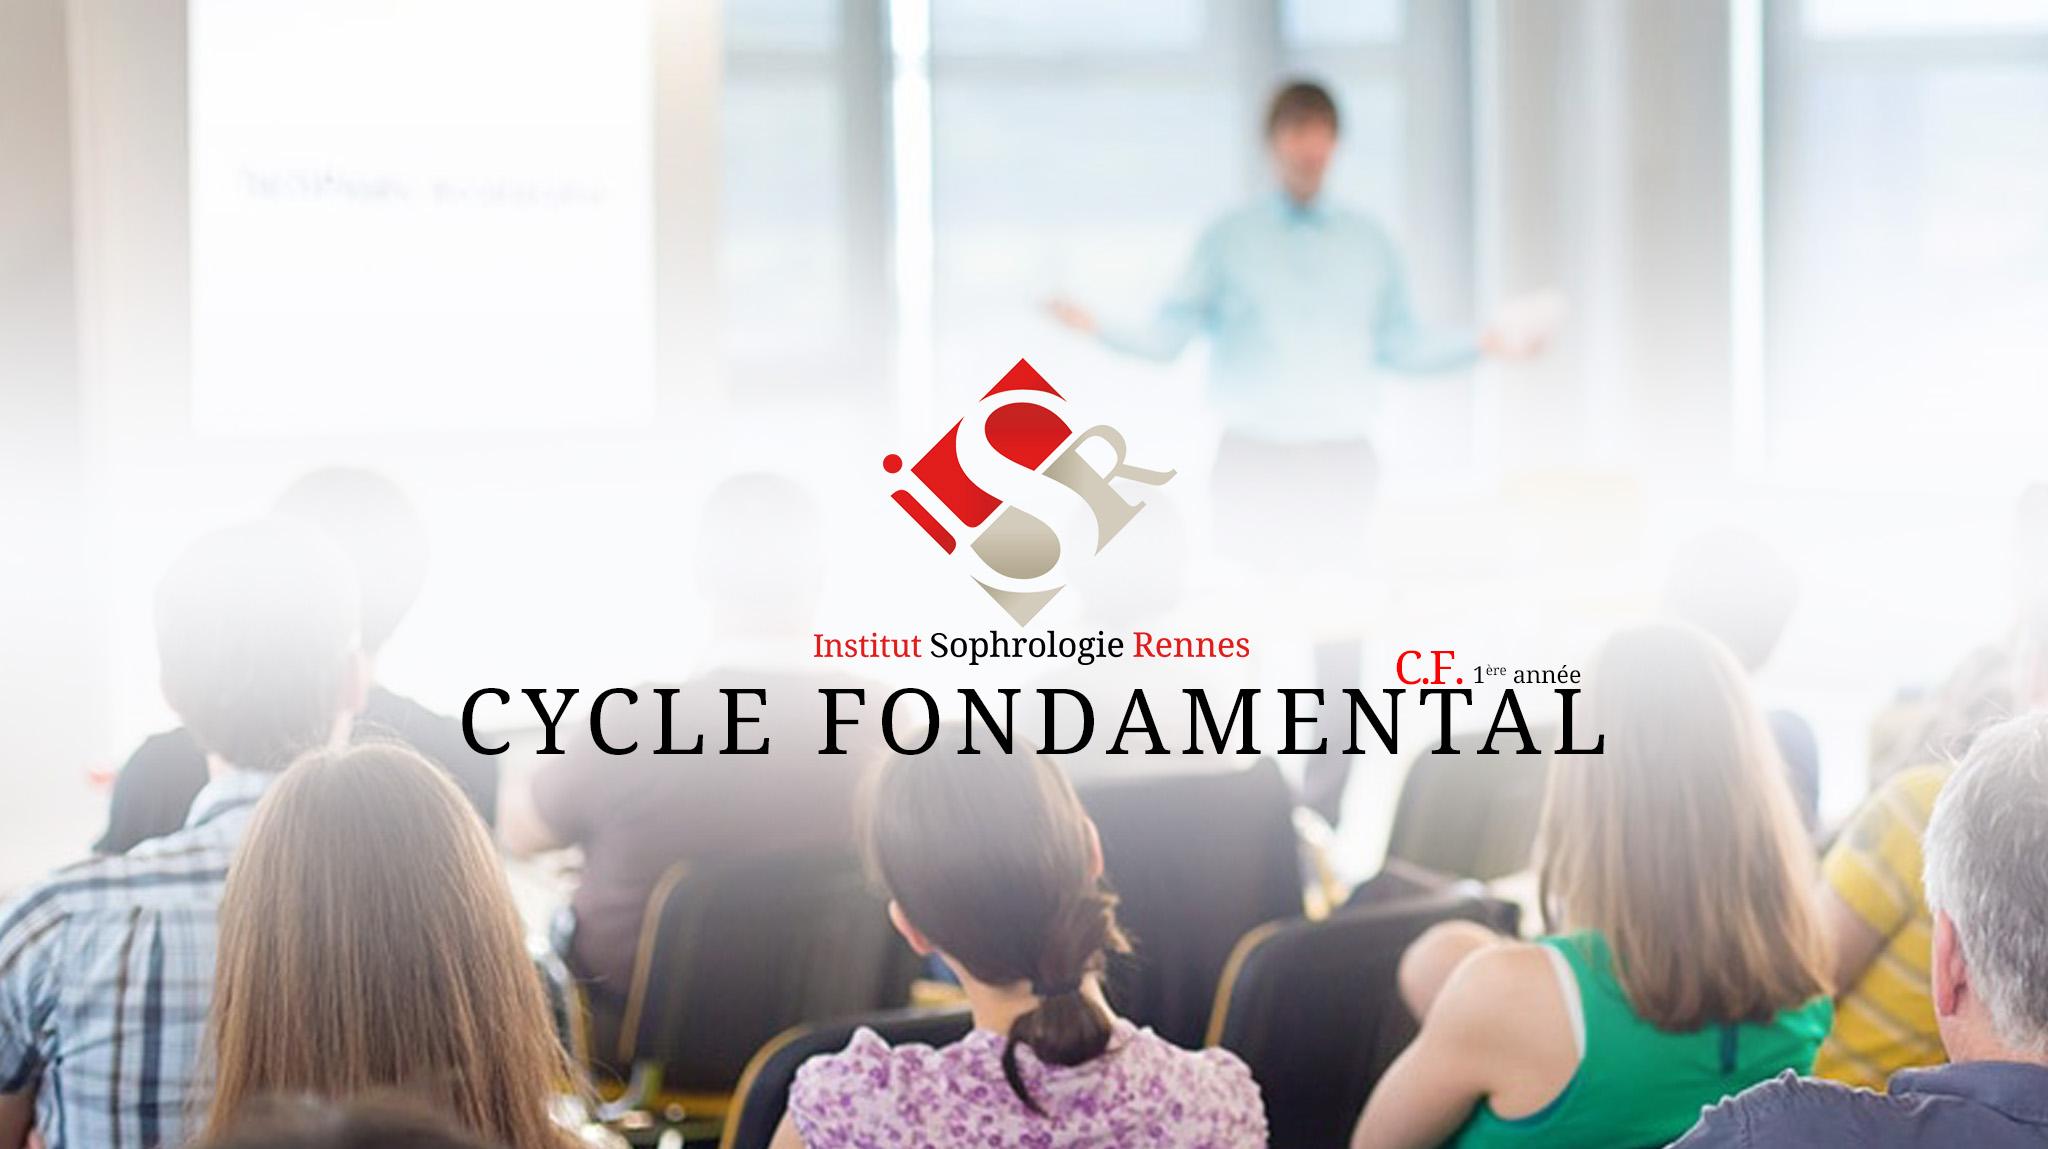 Cycle Fondamental - ISR